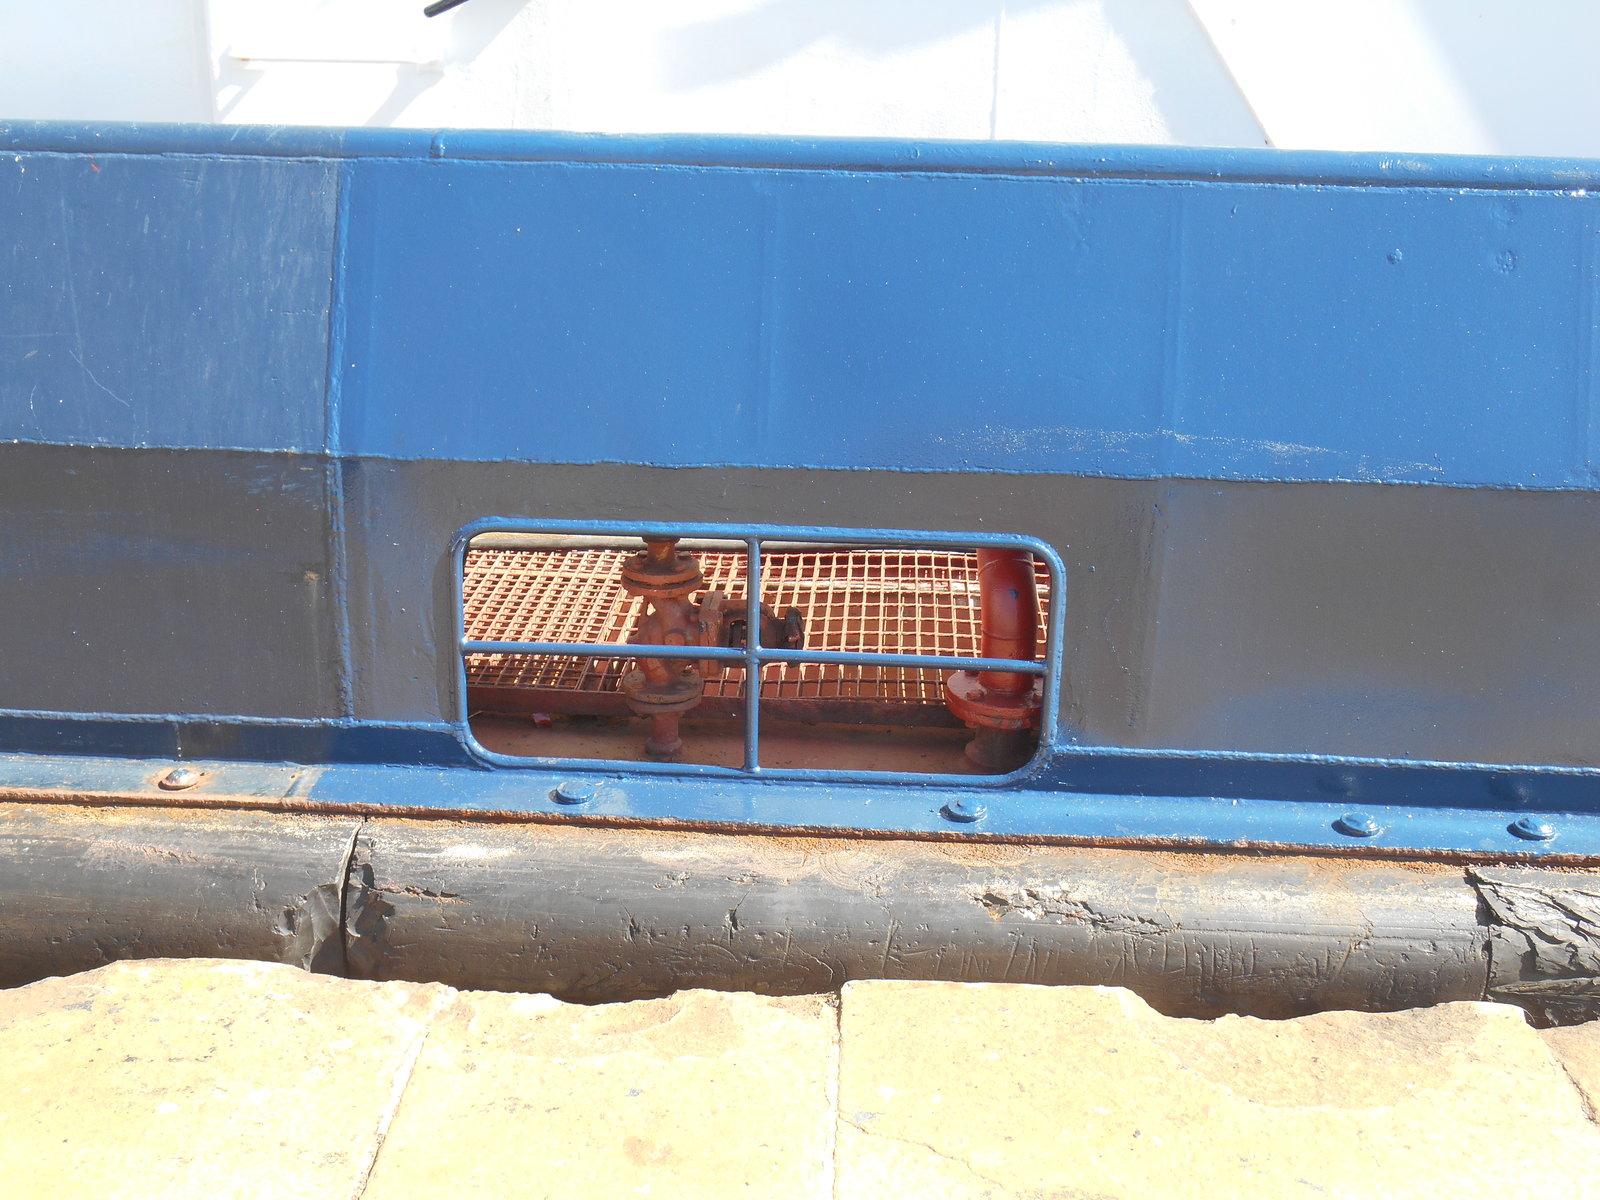 Tracteur azimutal VB Pouliguen de Namornik 200708010529475918